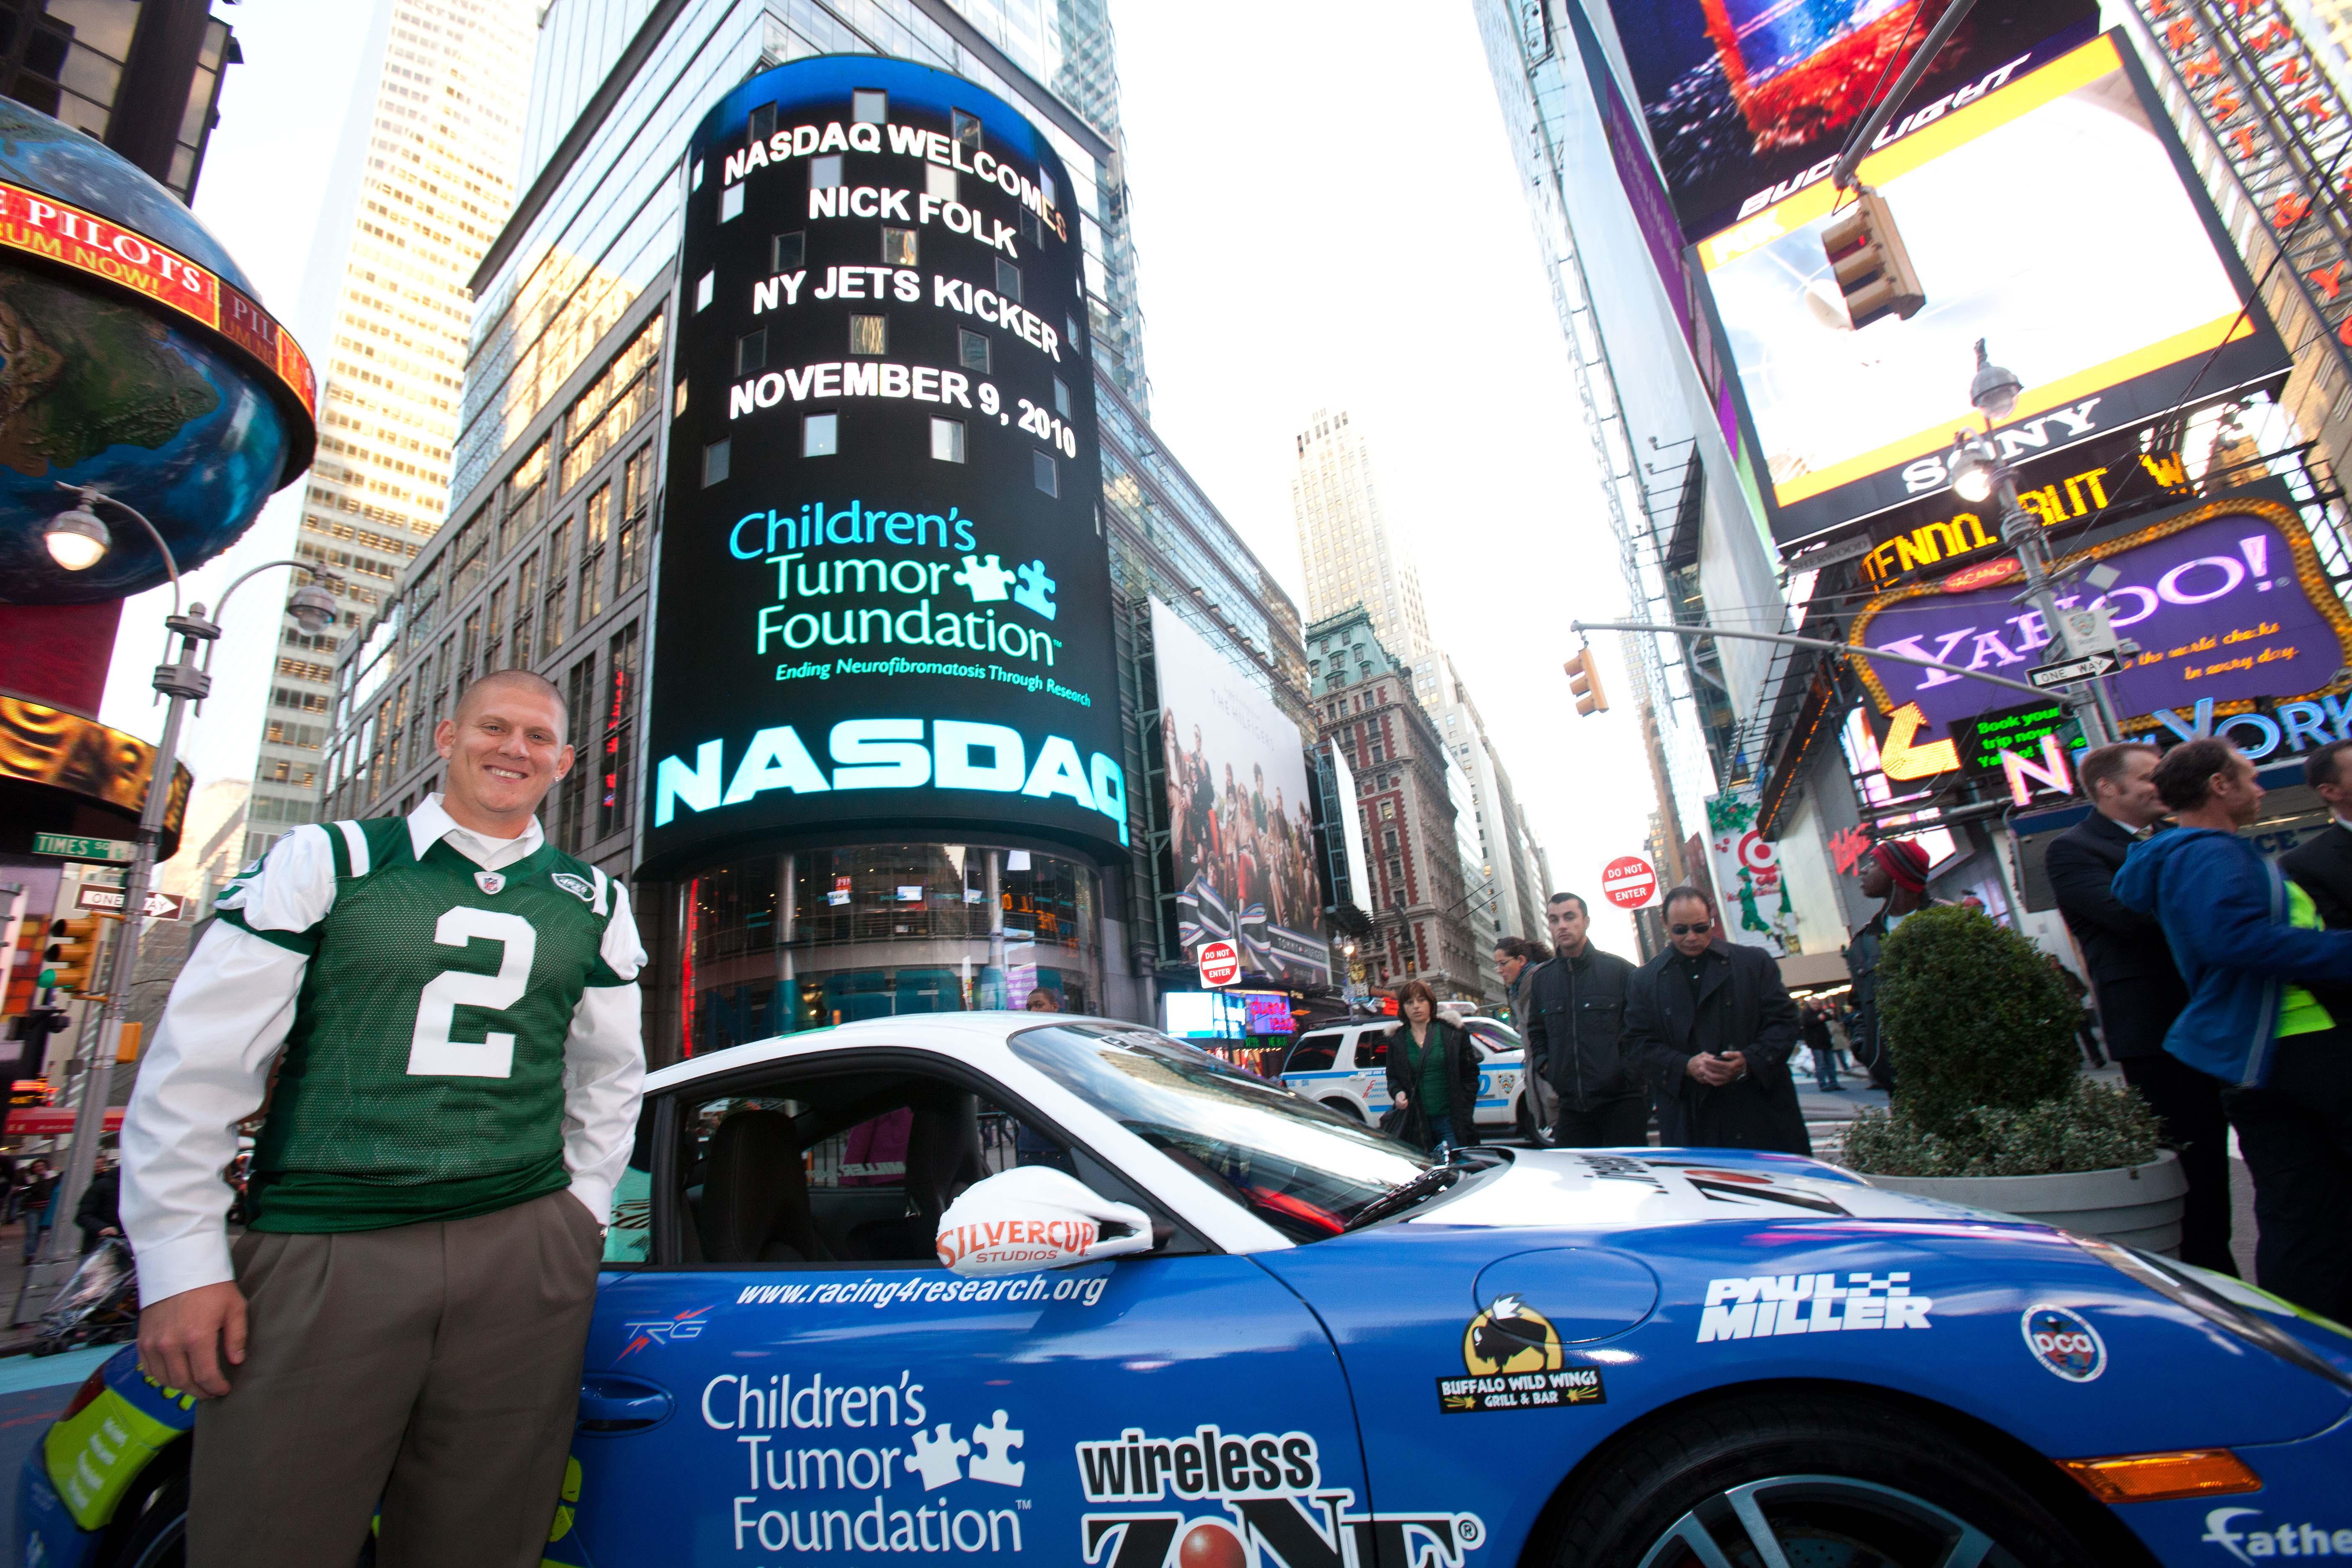 Nick Folk - NASDAQ